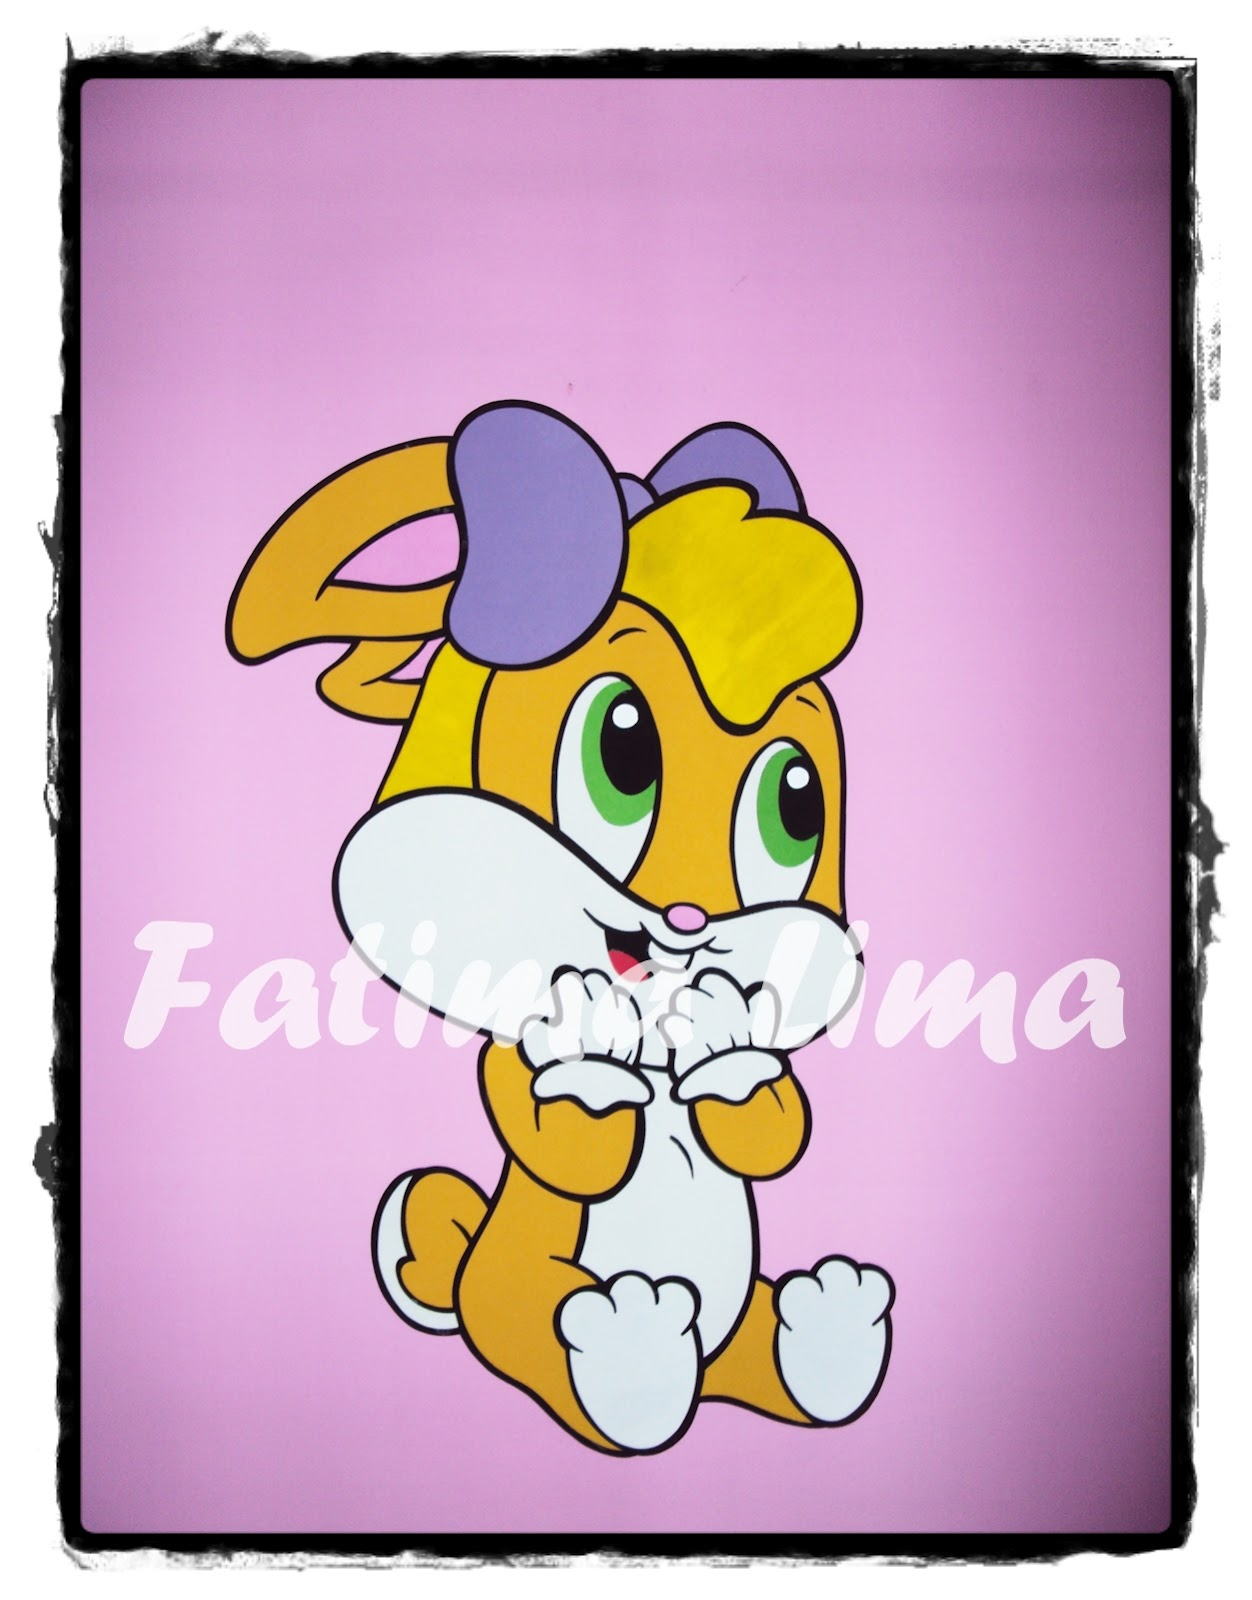 Eva charmosa looney tunes baby - Bebe looney tunes ...